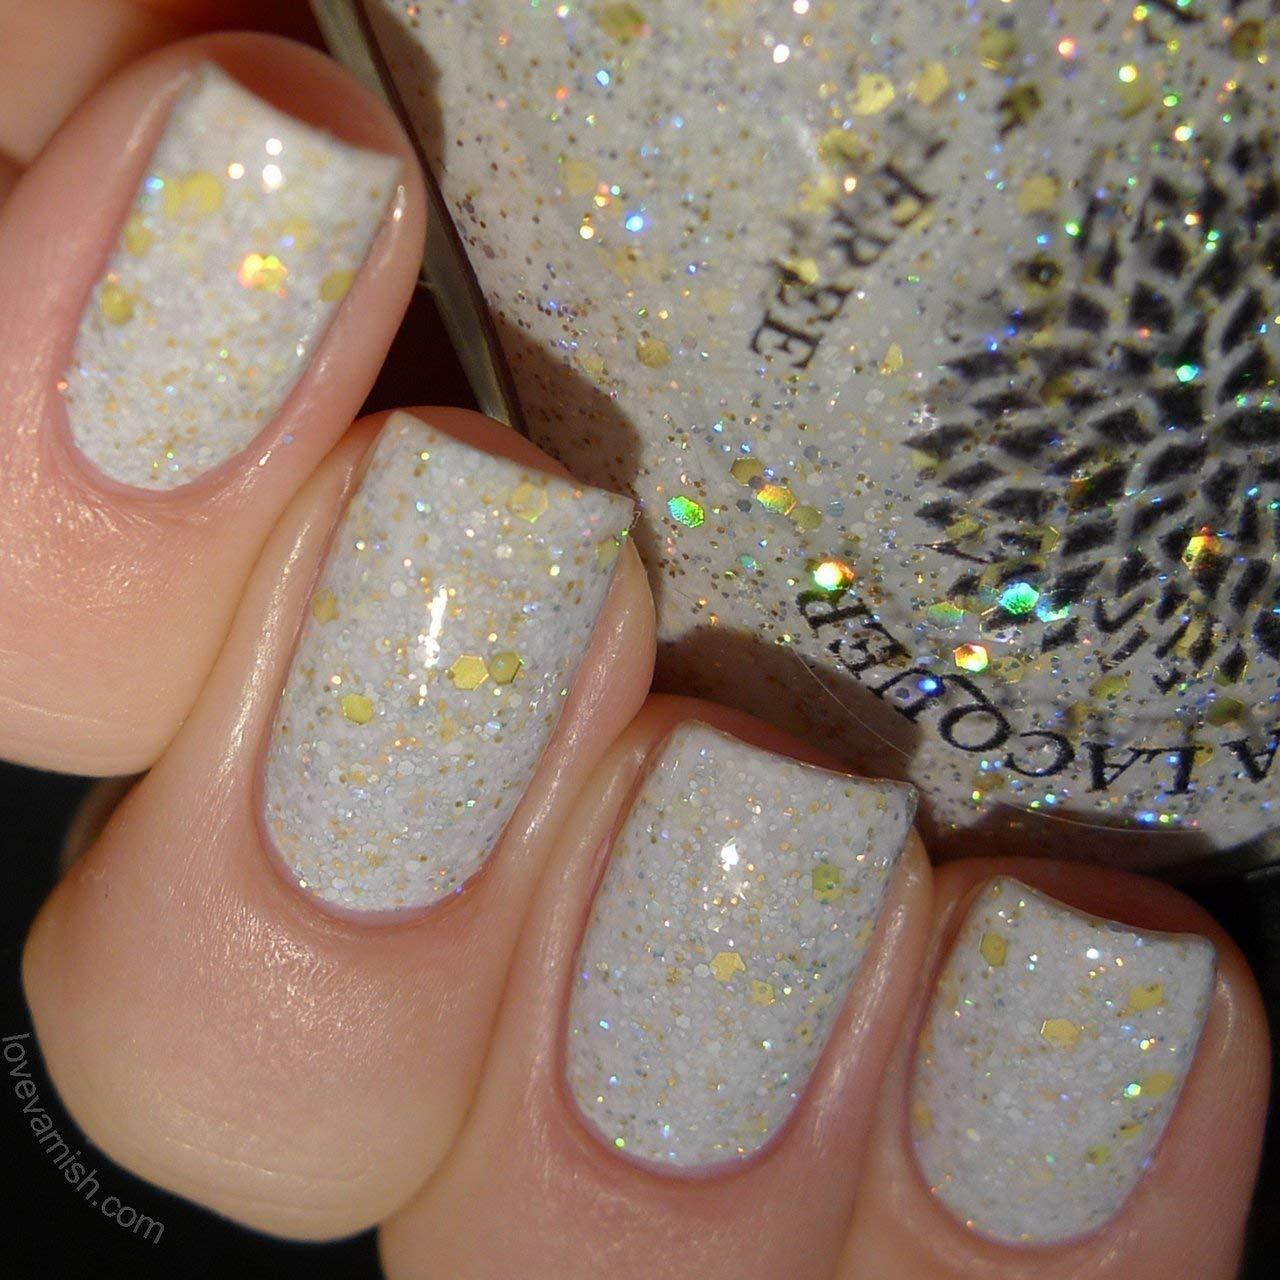 Amazon.com: Olaf\'s Snowflowers | White Nail Polish with Holo Gold ...